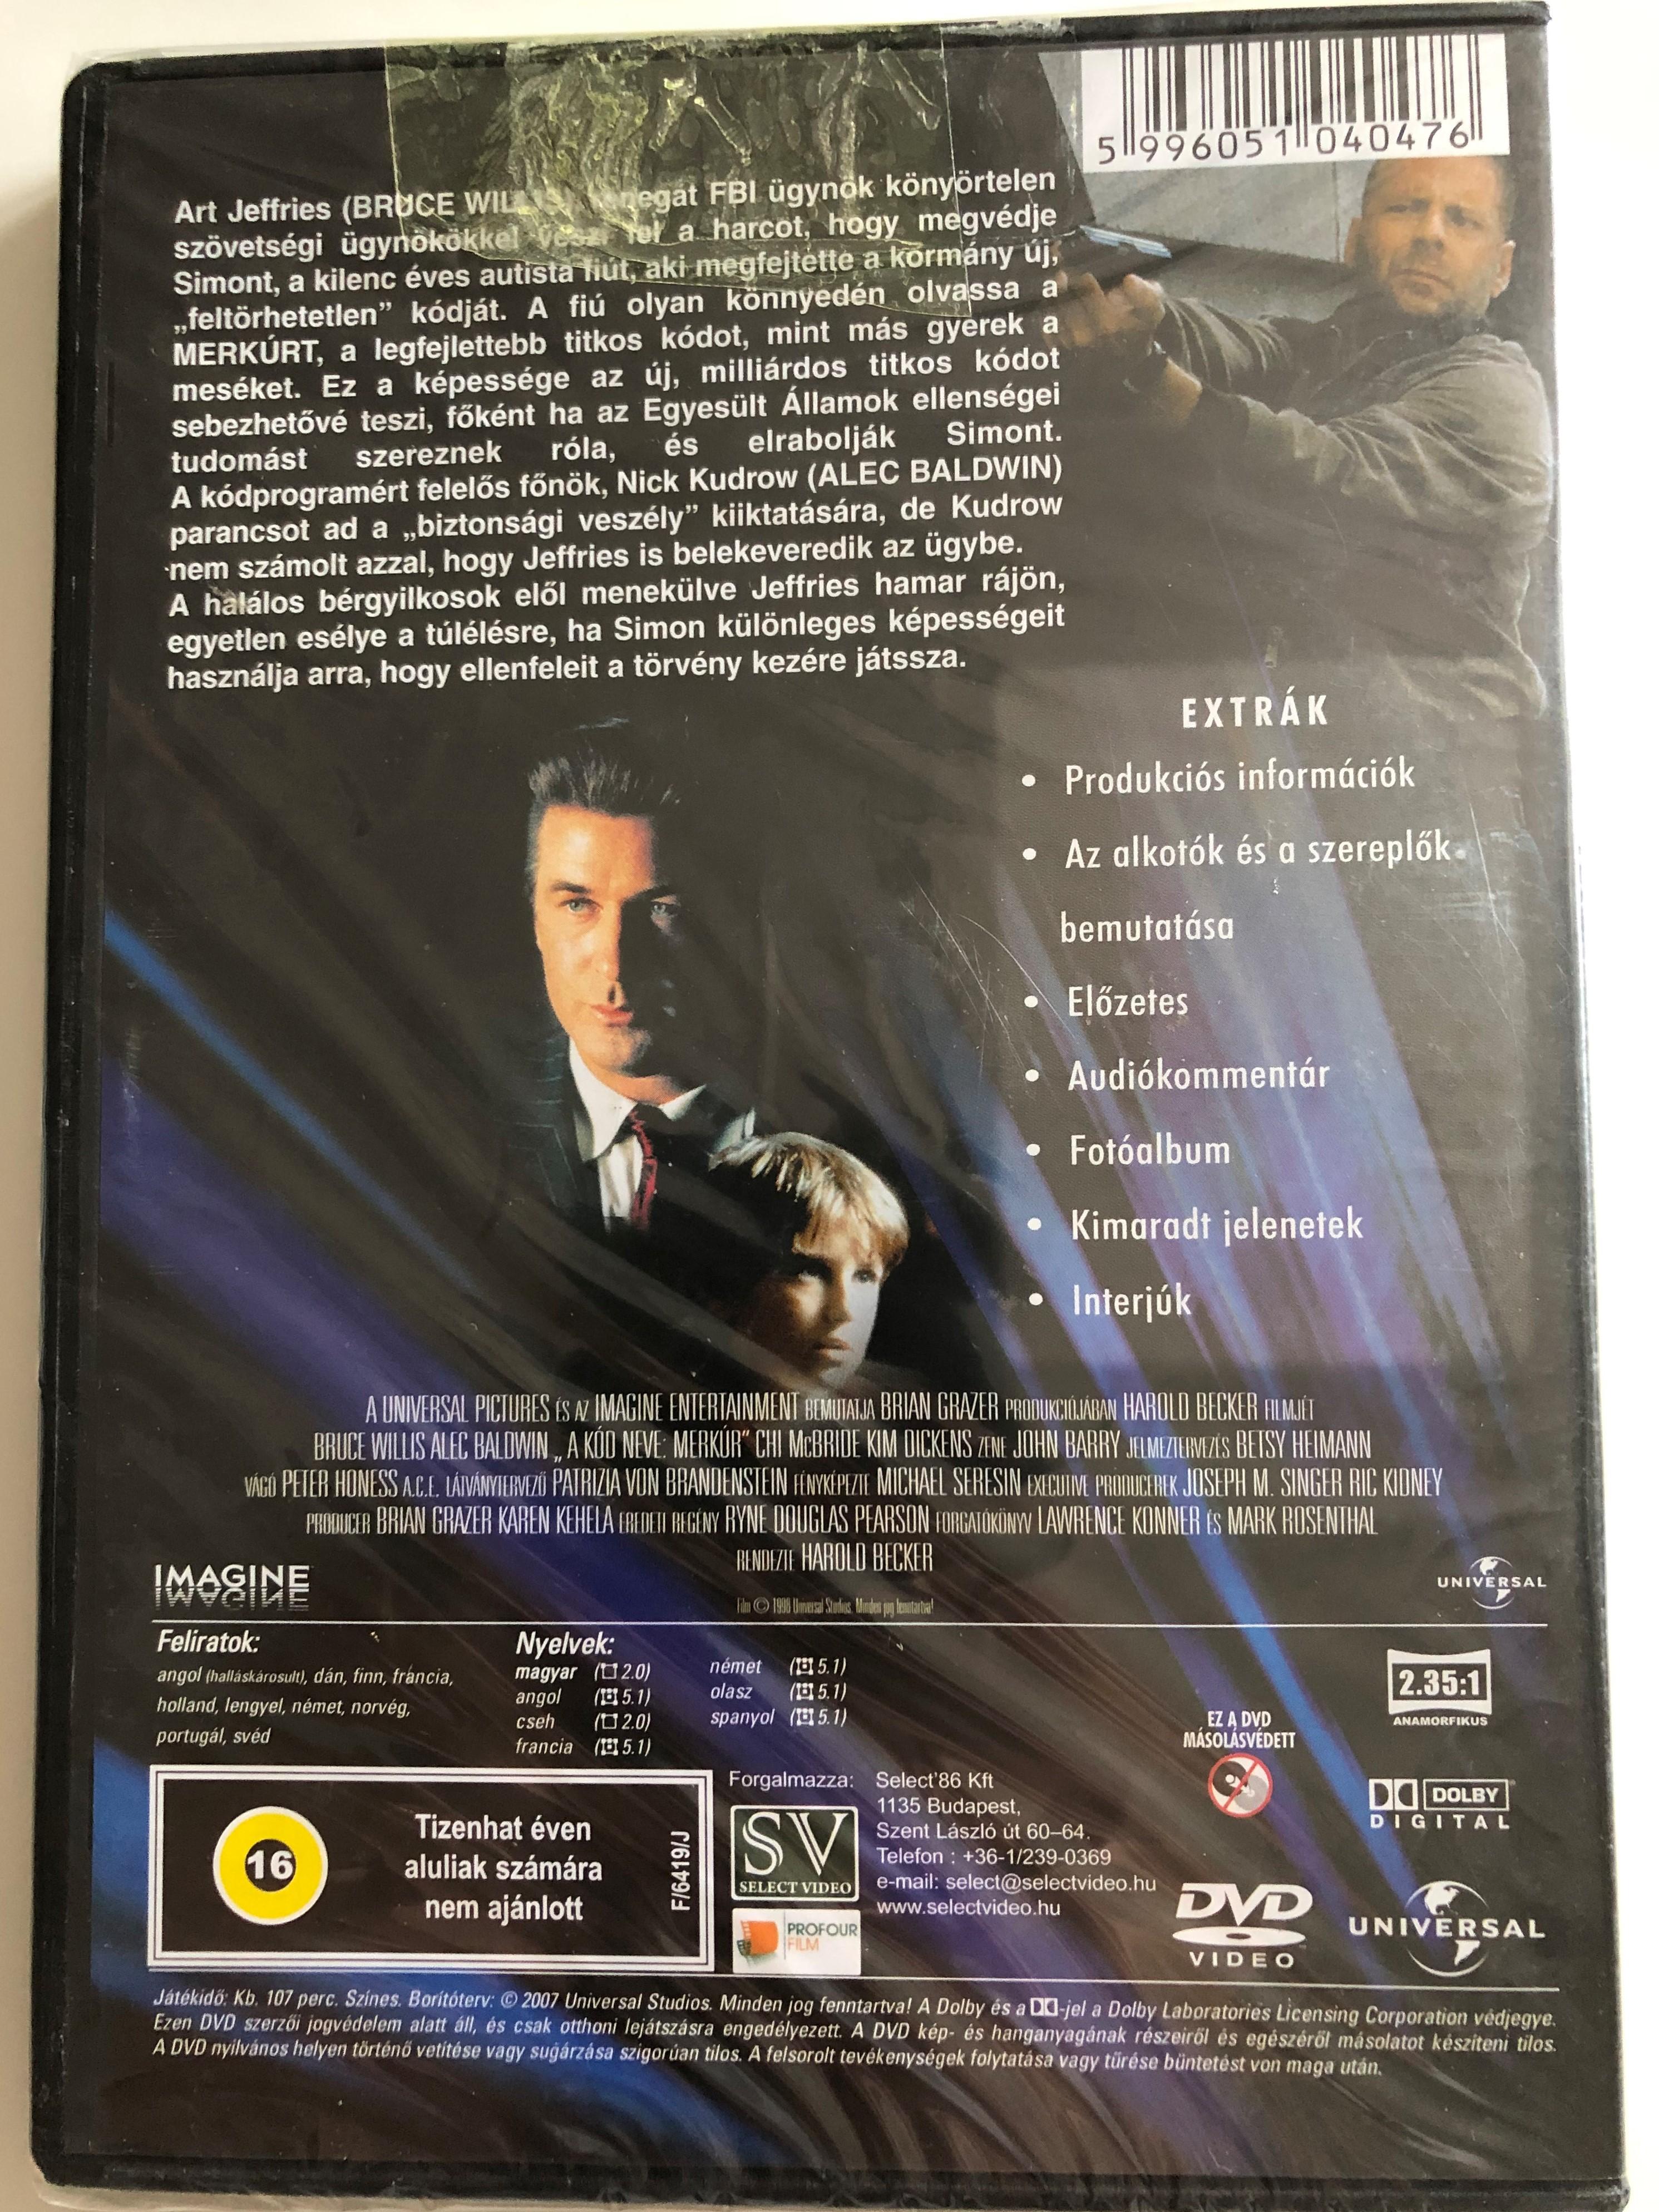 mercury-rising-dvd-1998-a-k-d-neve-merk-r-2.jpg